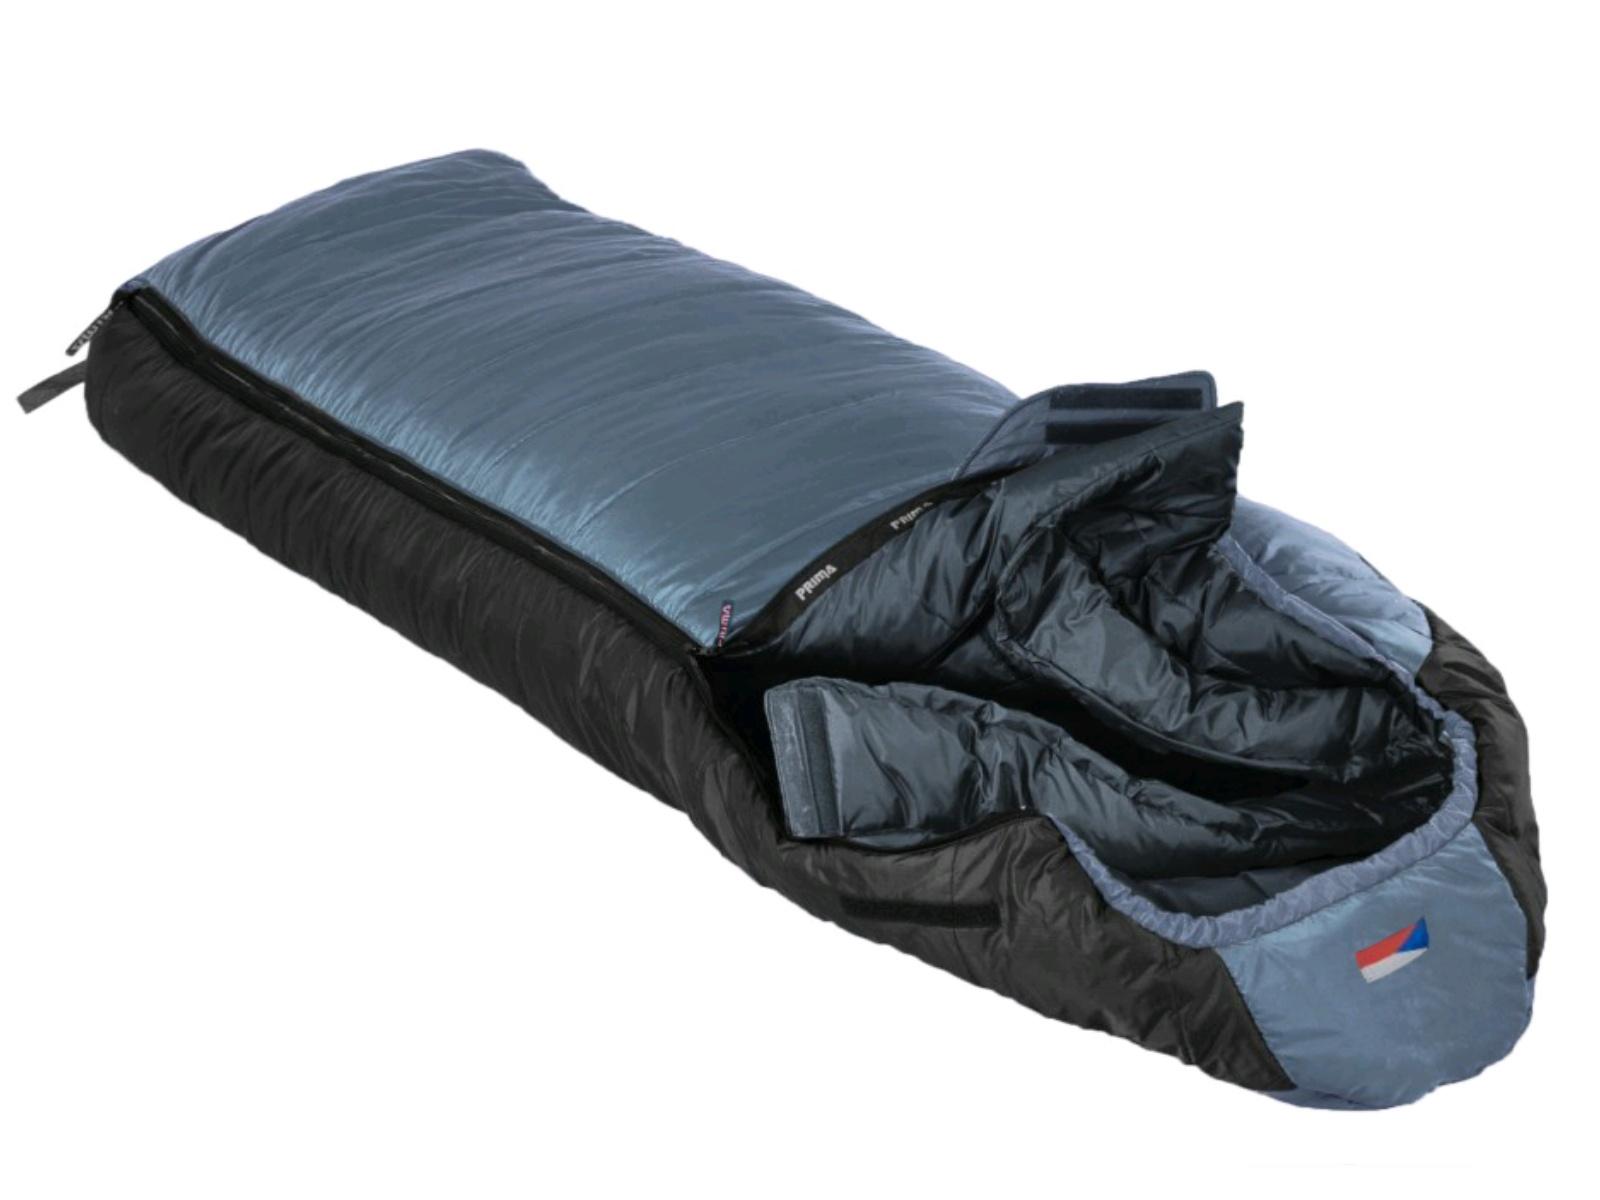 Spací vak PRIMA Makalu 230 Comfortable šedý - ľavý zips